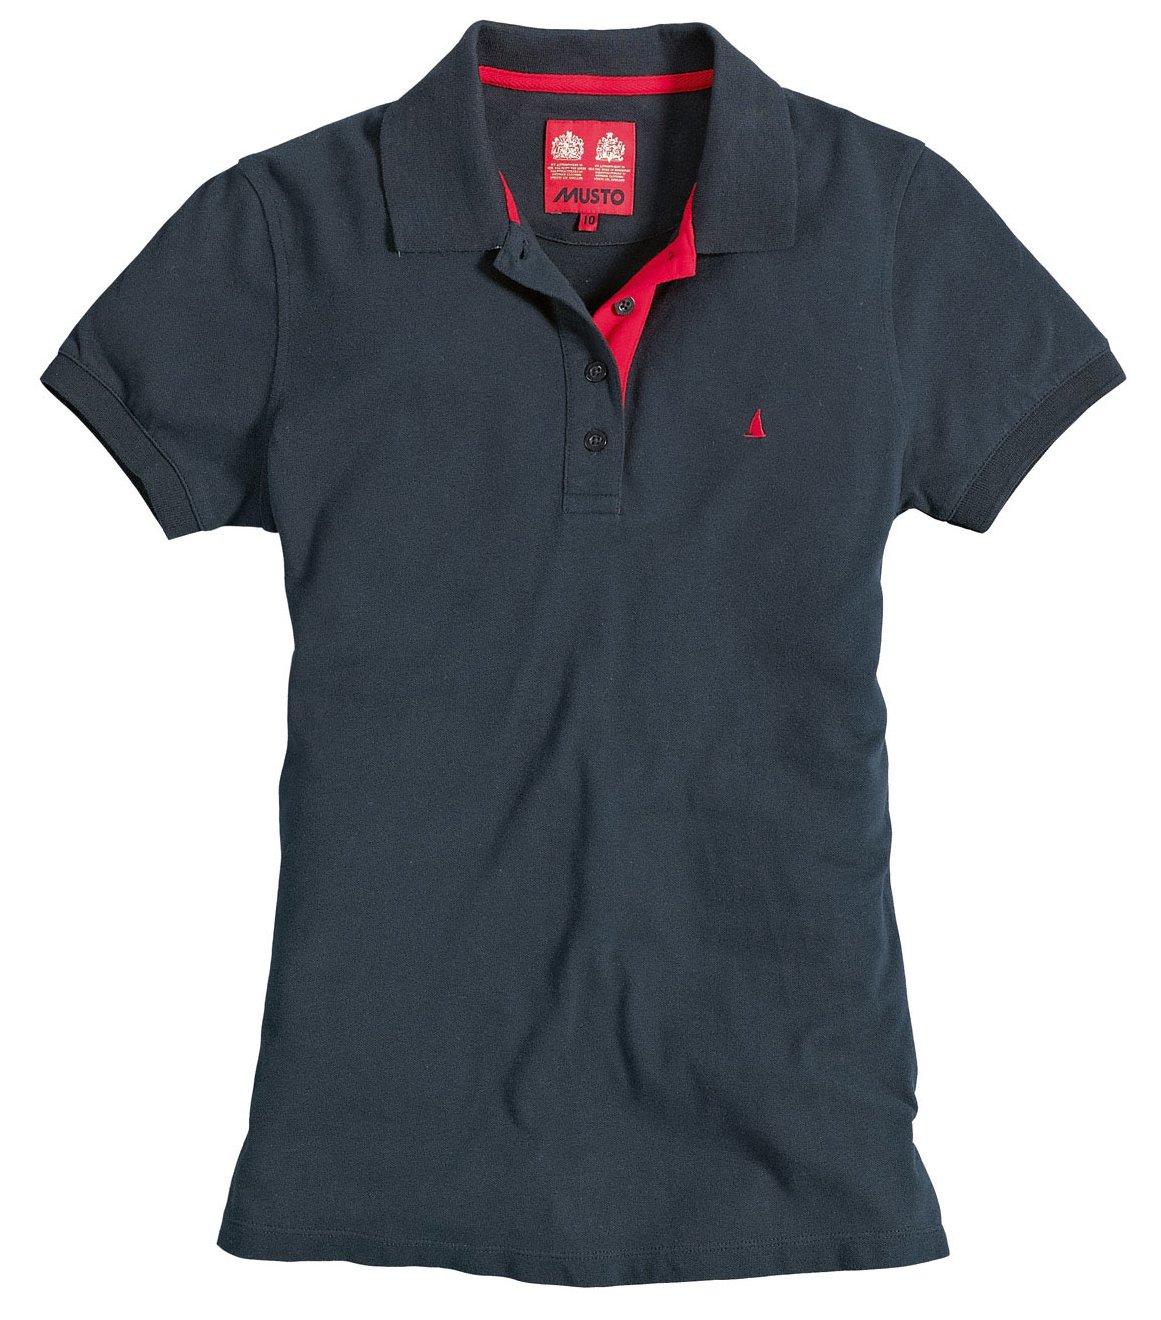 Musto Natalia Ladies Polo Shirt Navy Redpost Equestrian